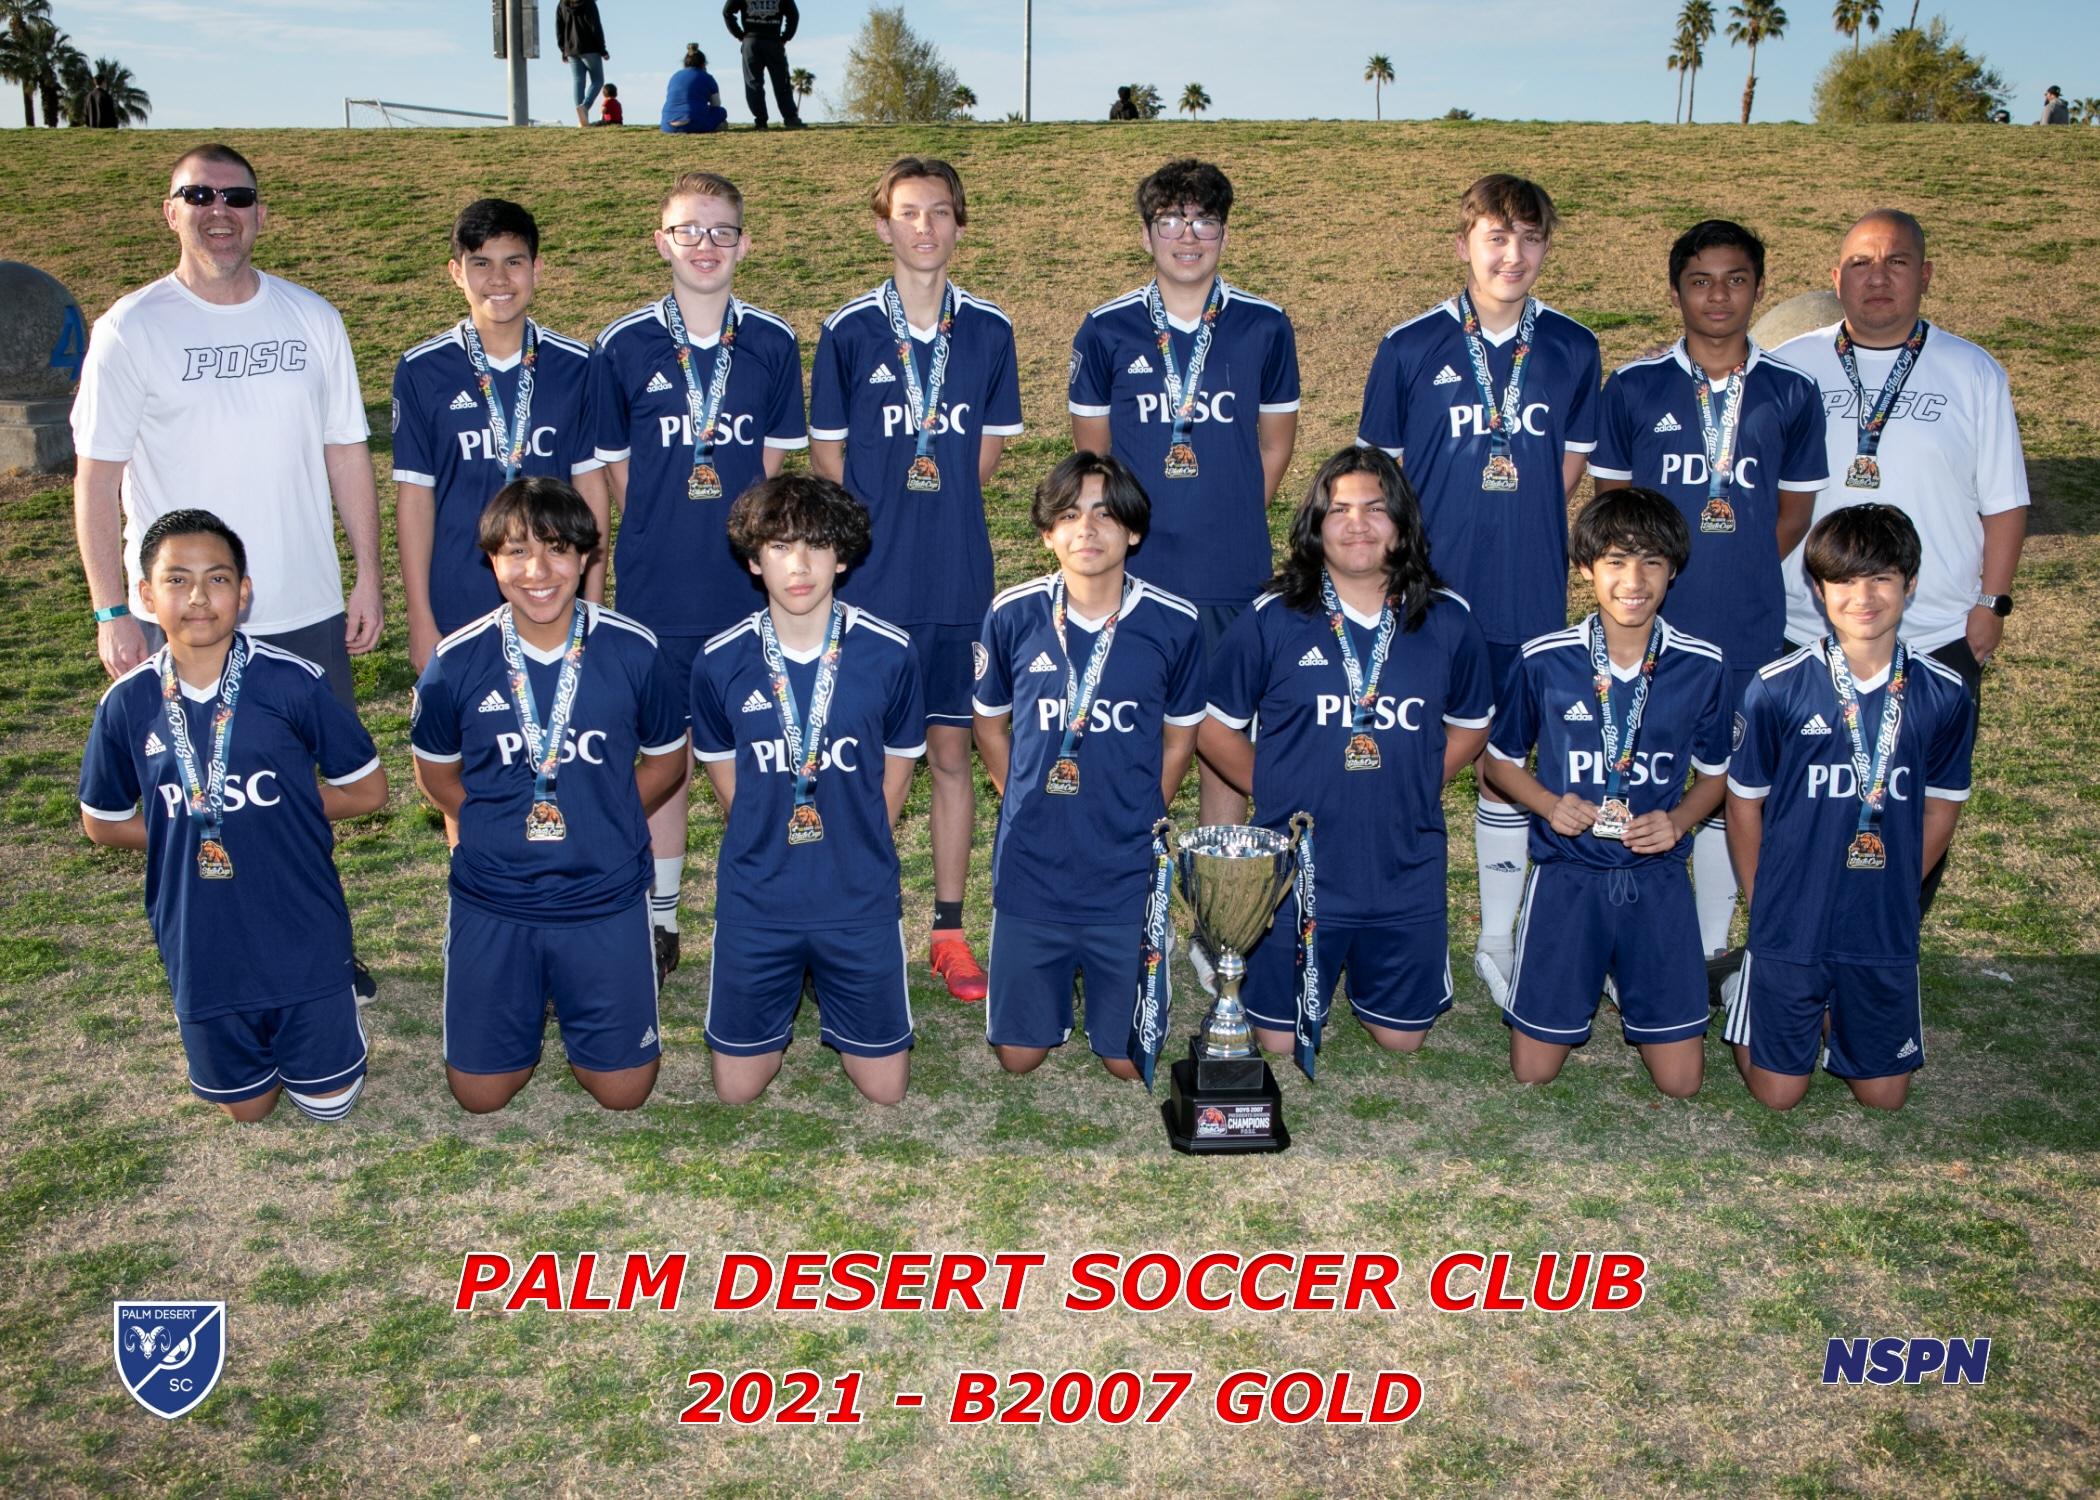 Palm Desert Soccer Club B2007 Gold